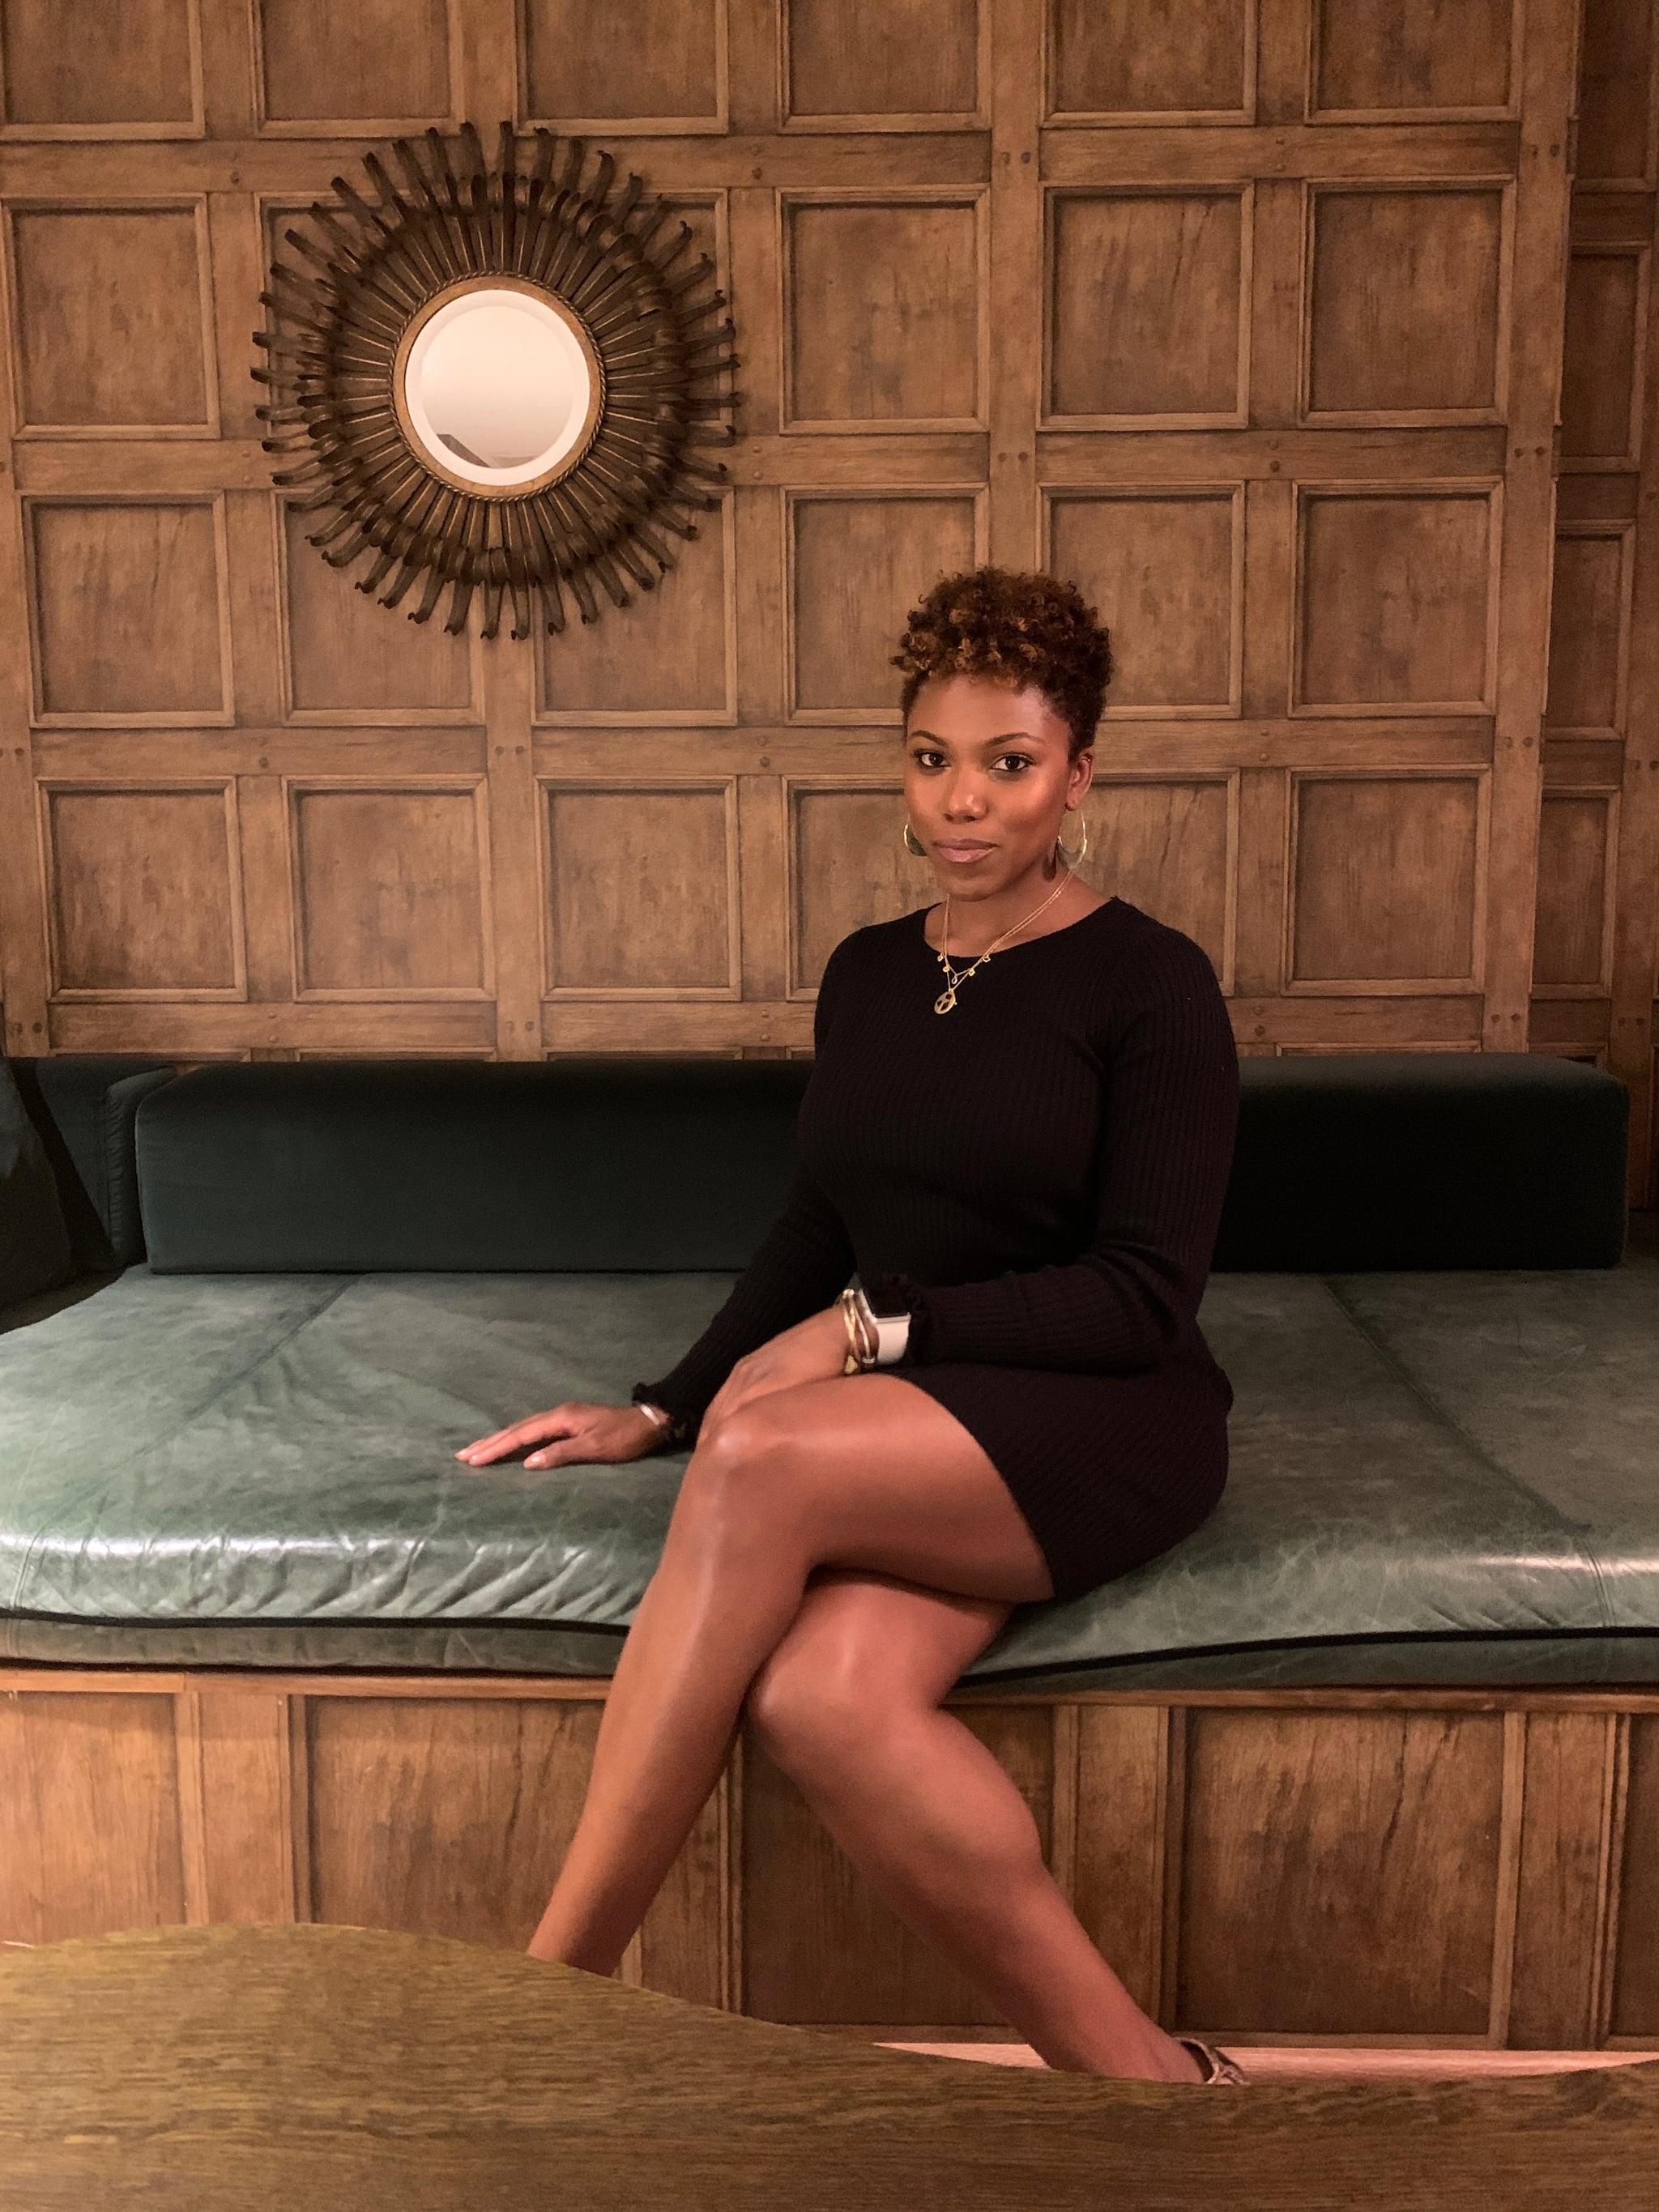 Mature black women pics Black Women On Finding Confidence Dressing Their Bodies Popsugar Fashion